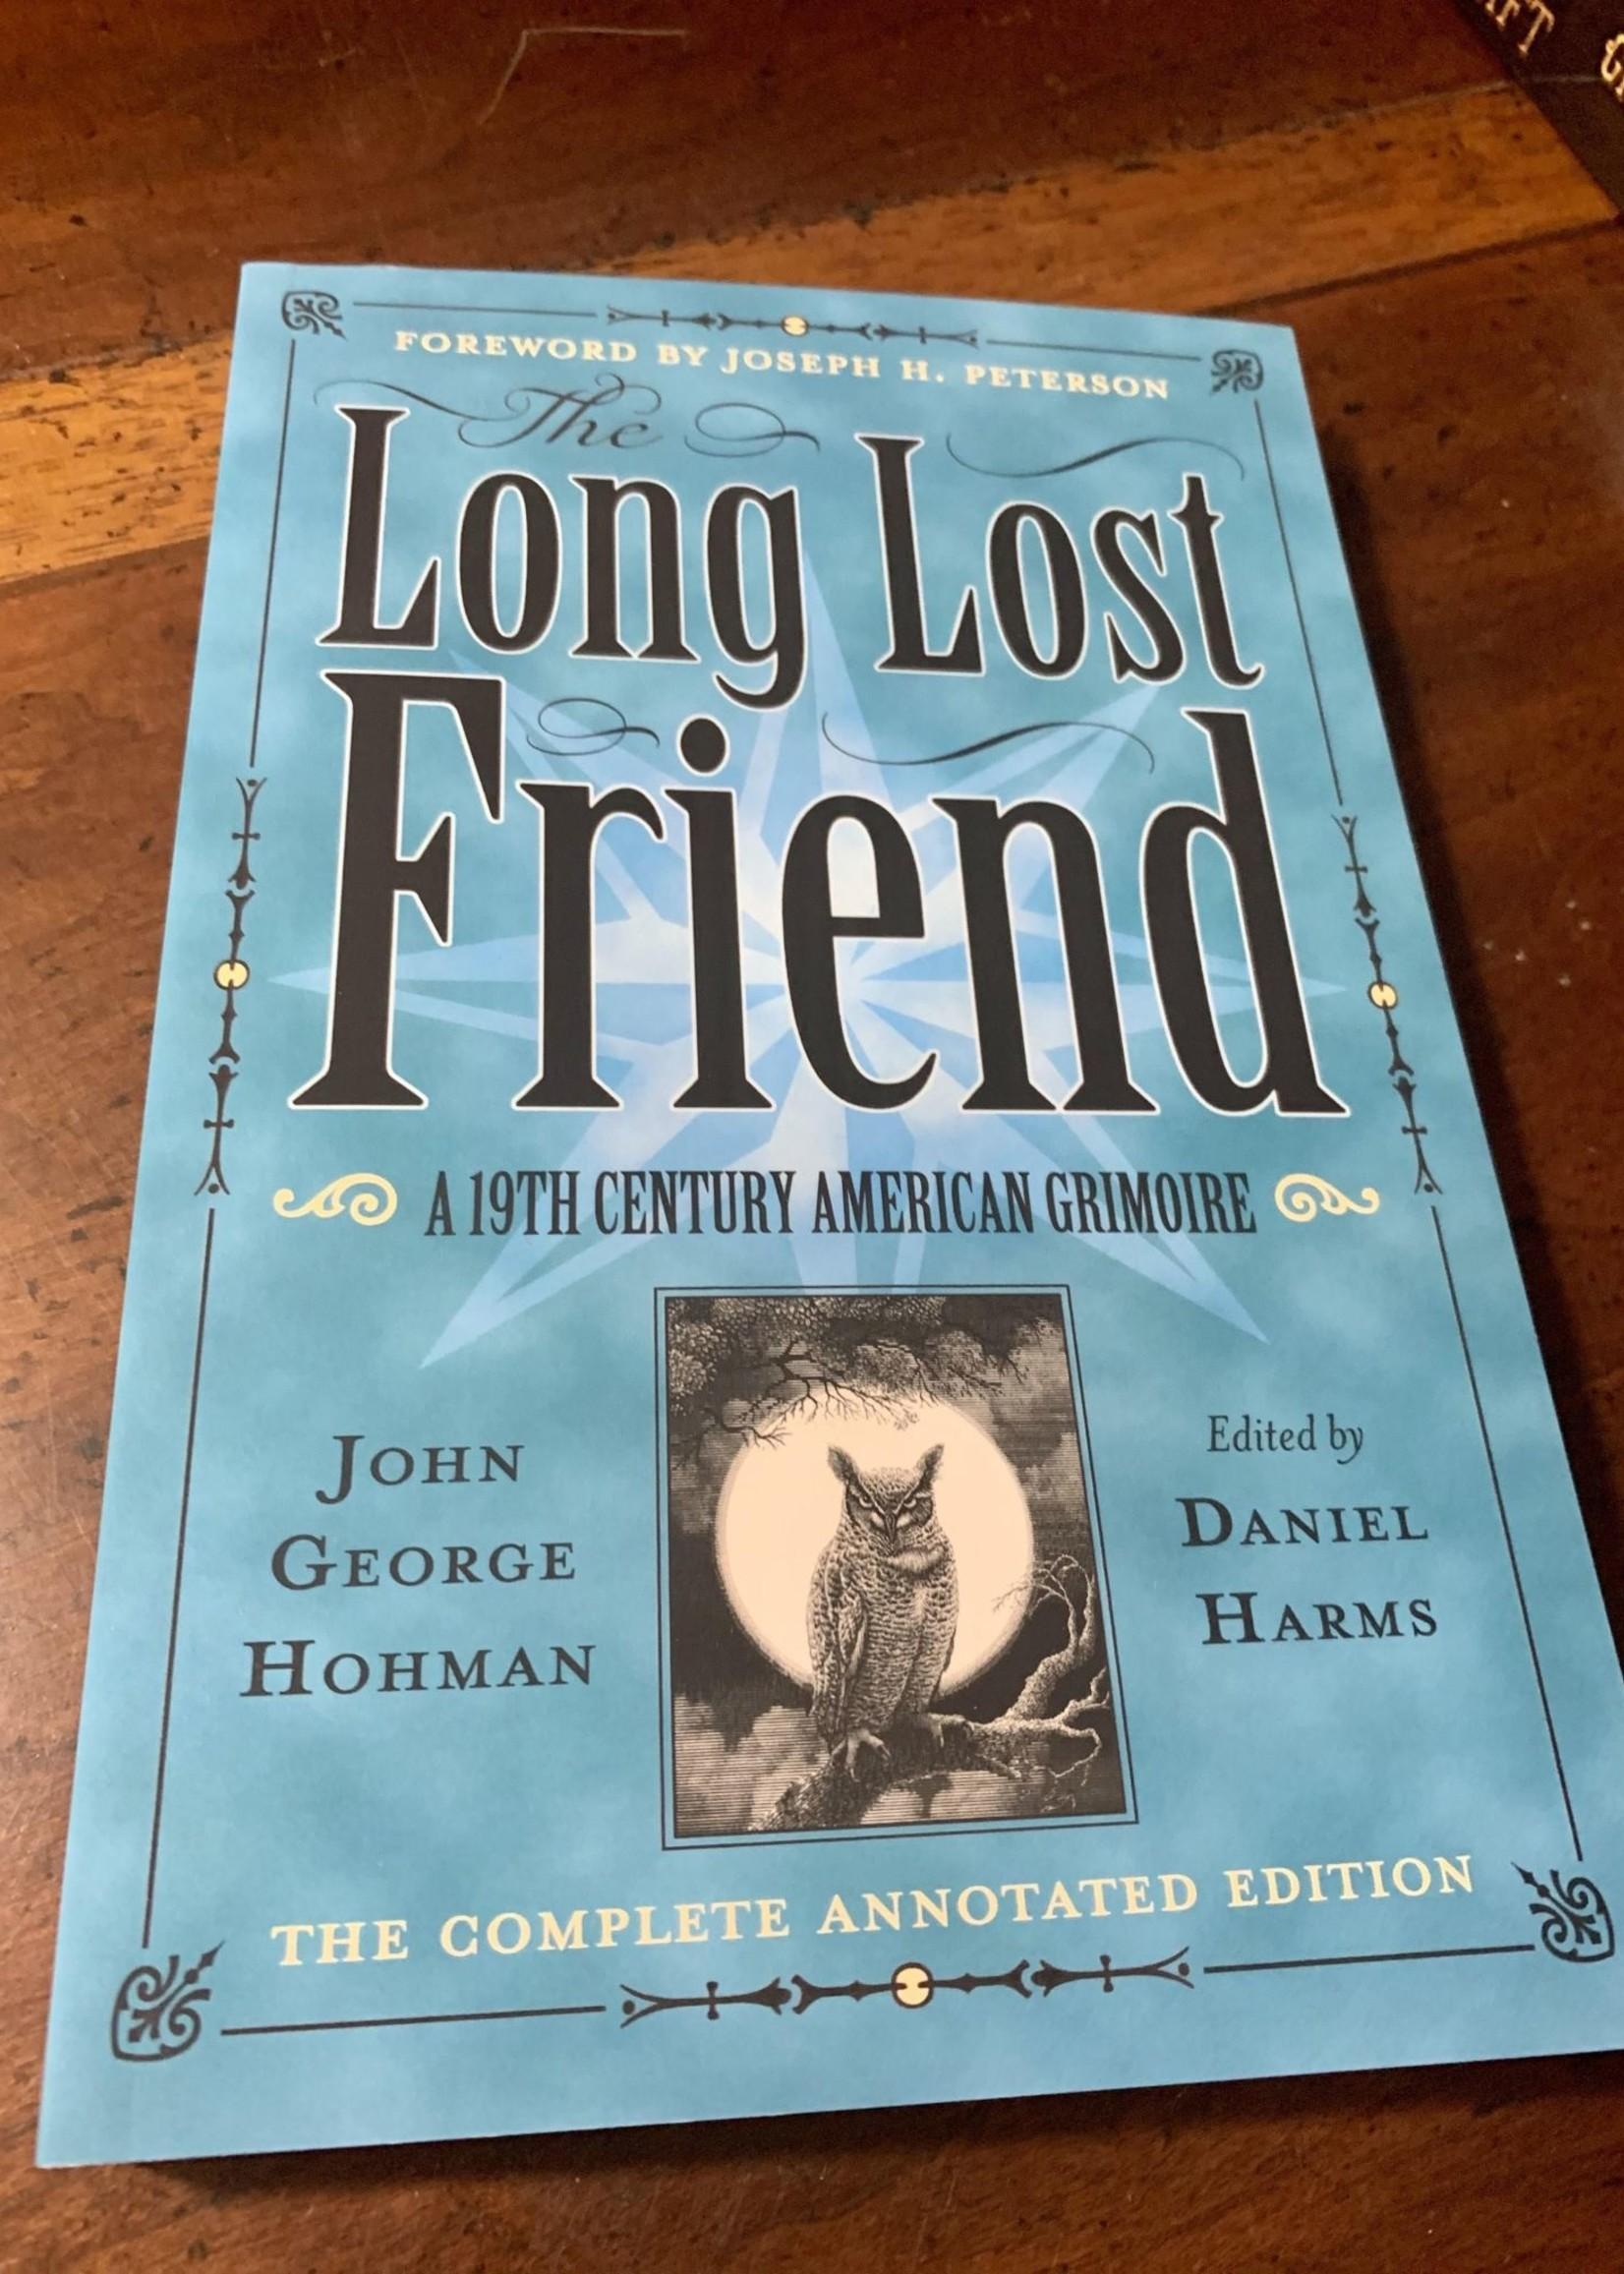 The Long Lost Friend - John George Hohman